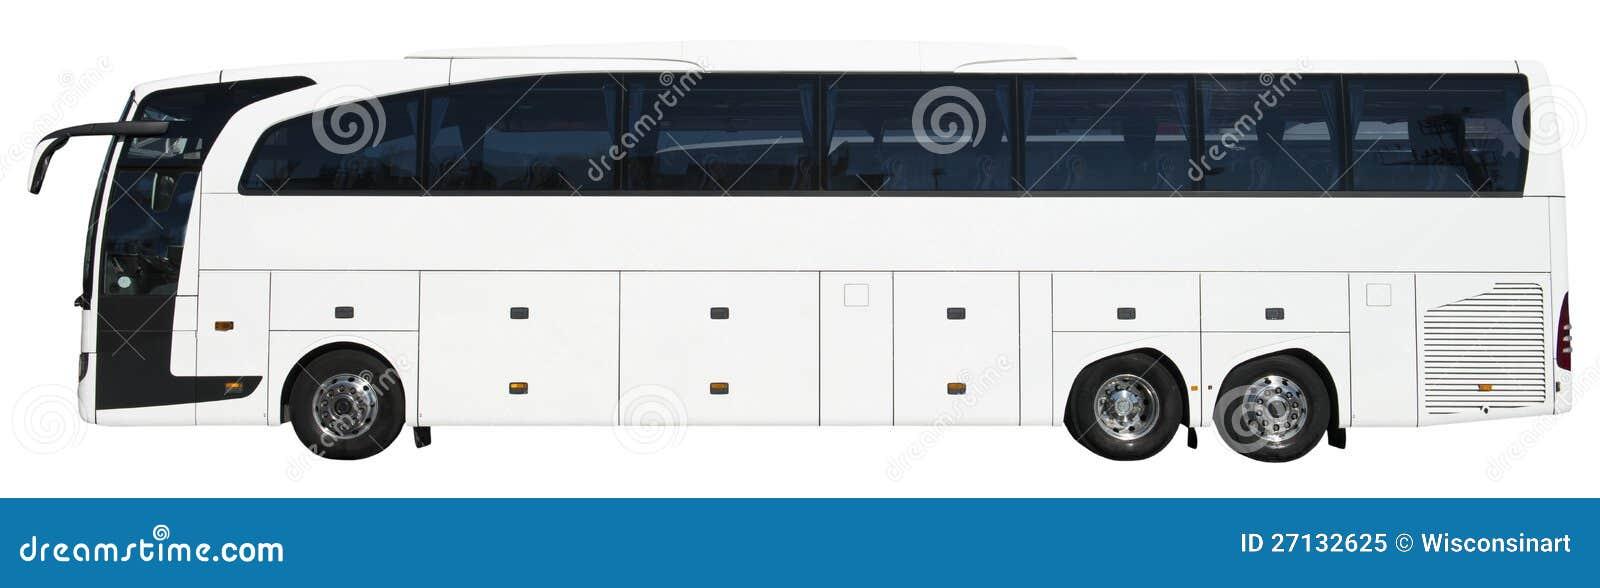 Voyage En Car D Excursion Luxe